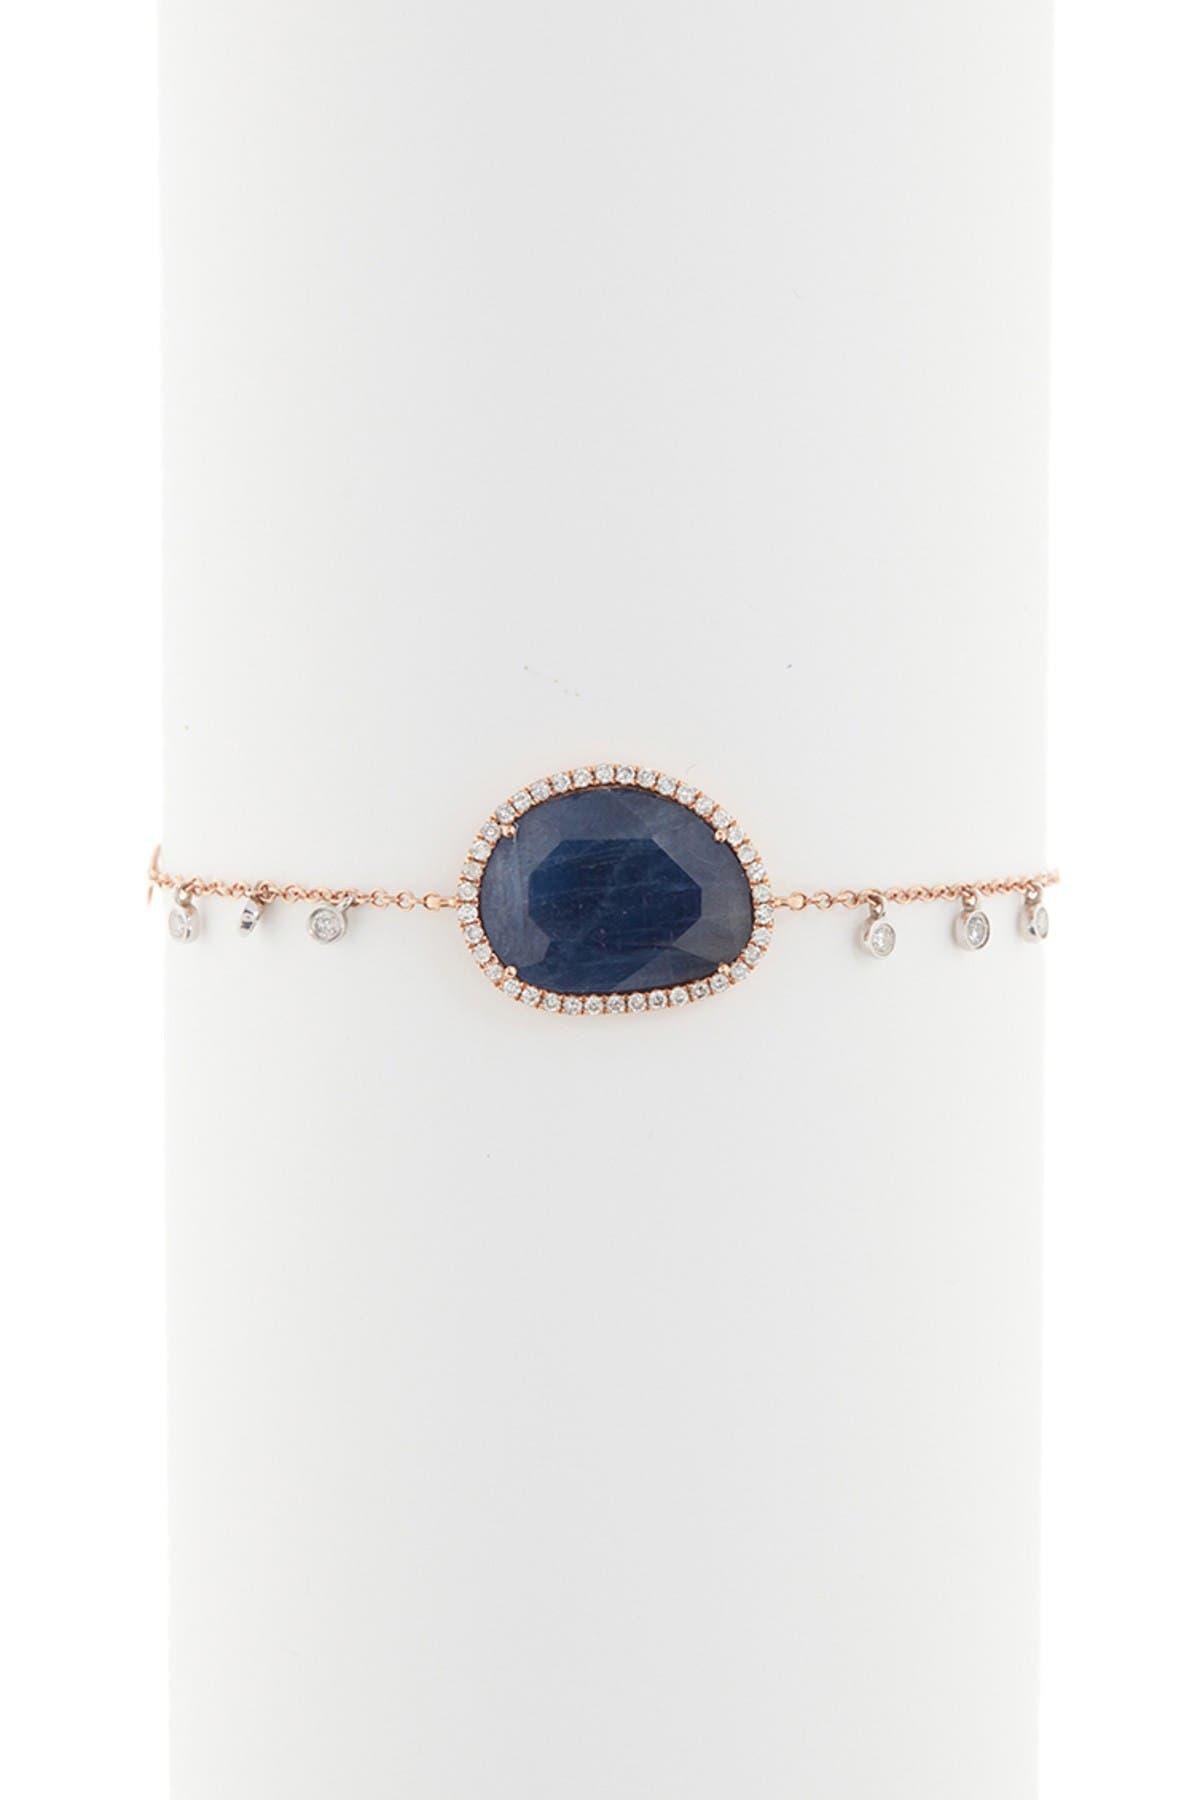 Image of Meira T 14K Rose Gold Blue Sapphire & Pave Diamond Charm Bracelet